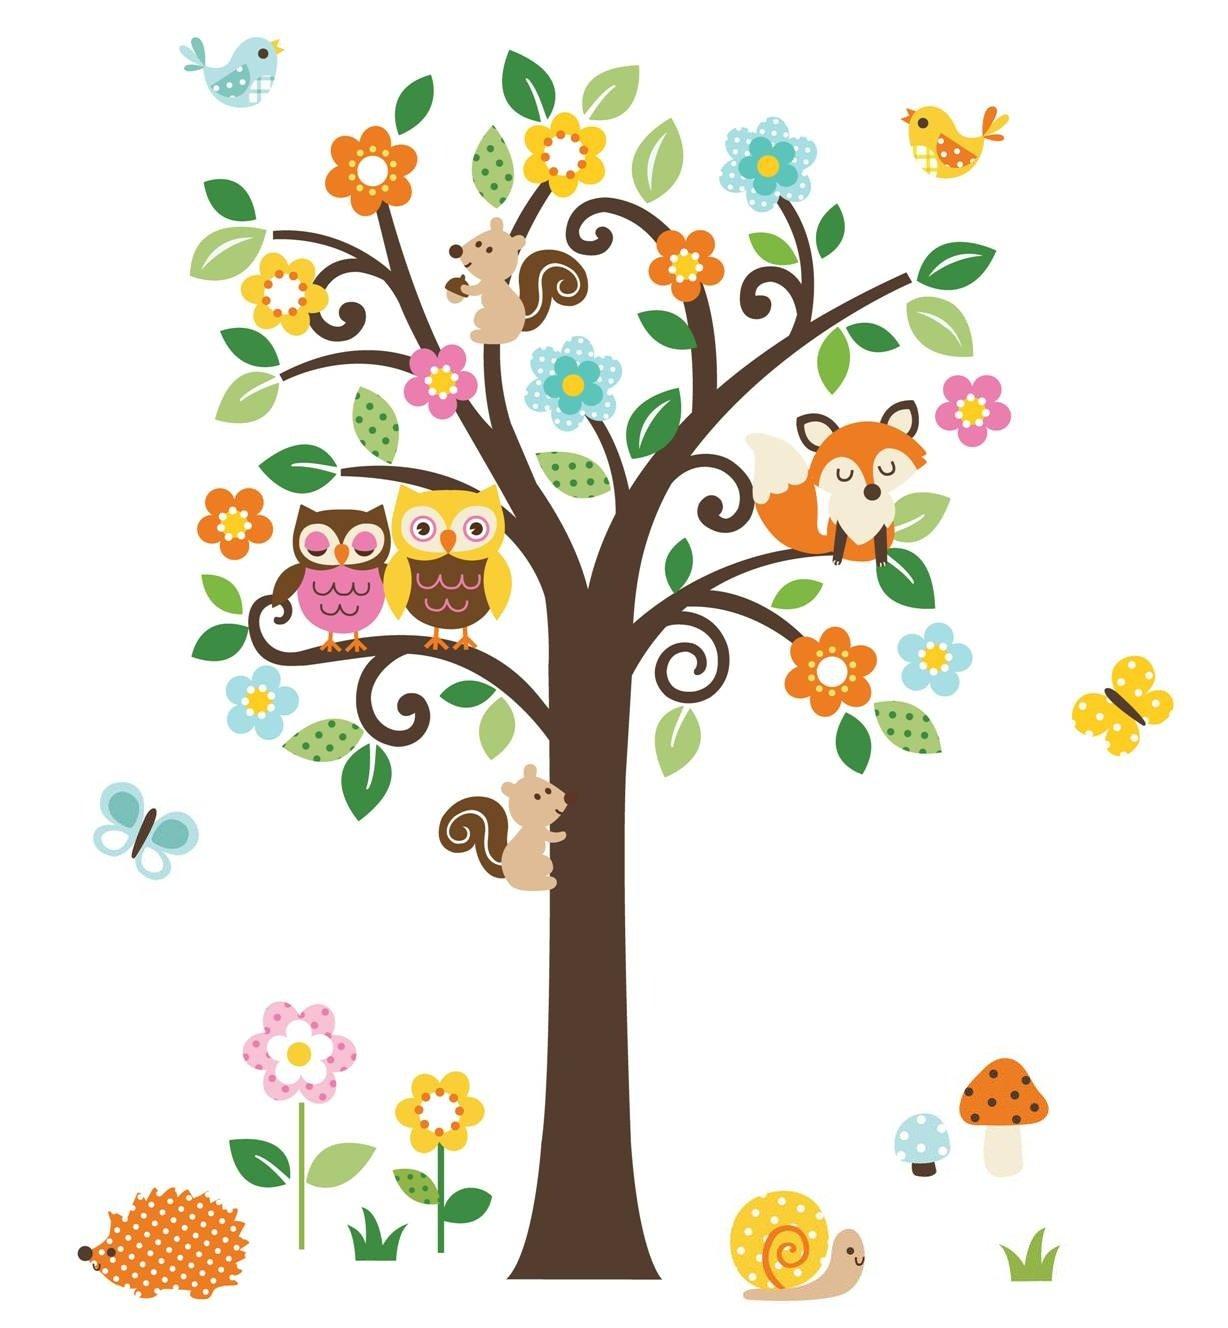 Amazon.com: Charming Woodland Giant Peel U0026 Stick Wall Art Sticker Decals:  Baby